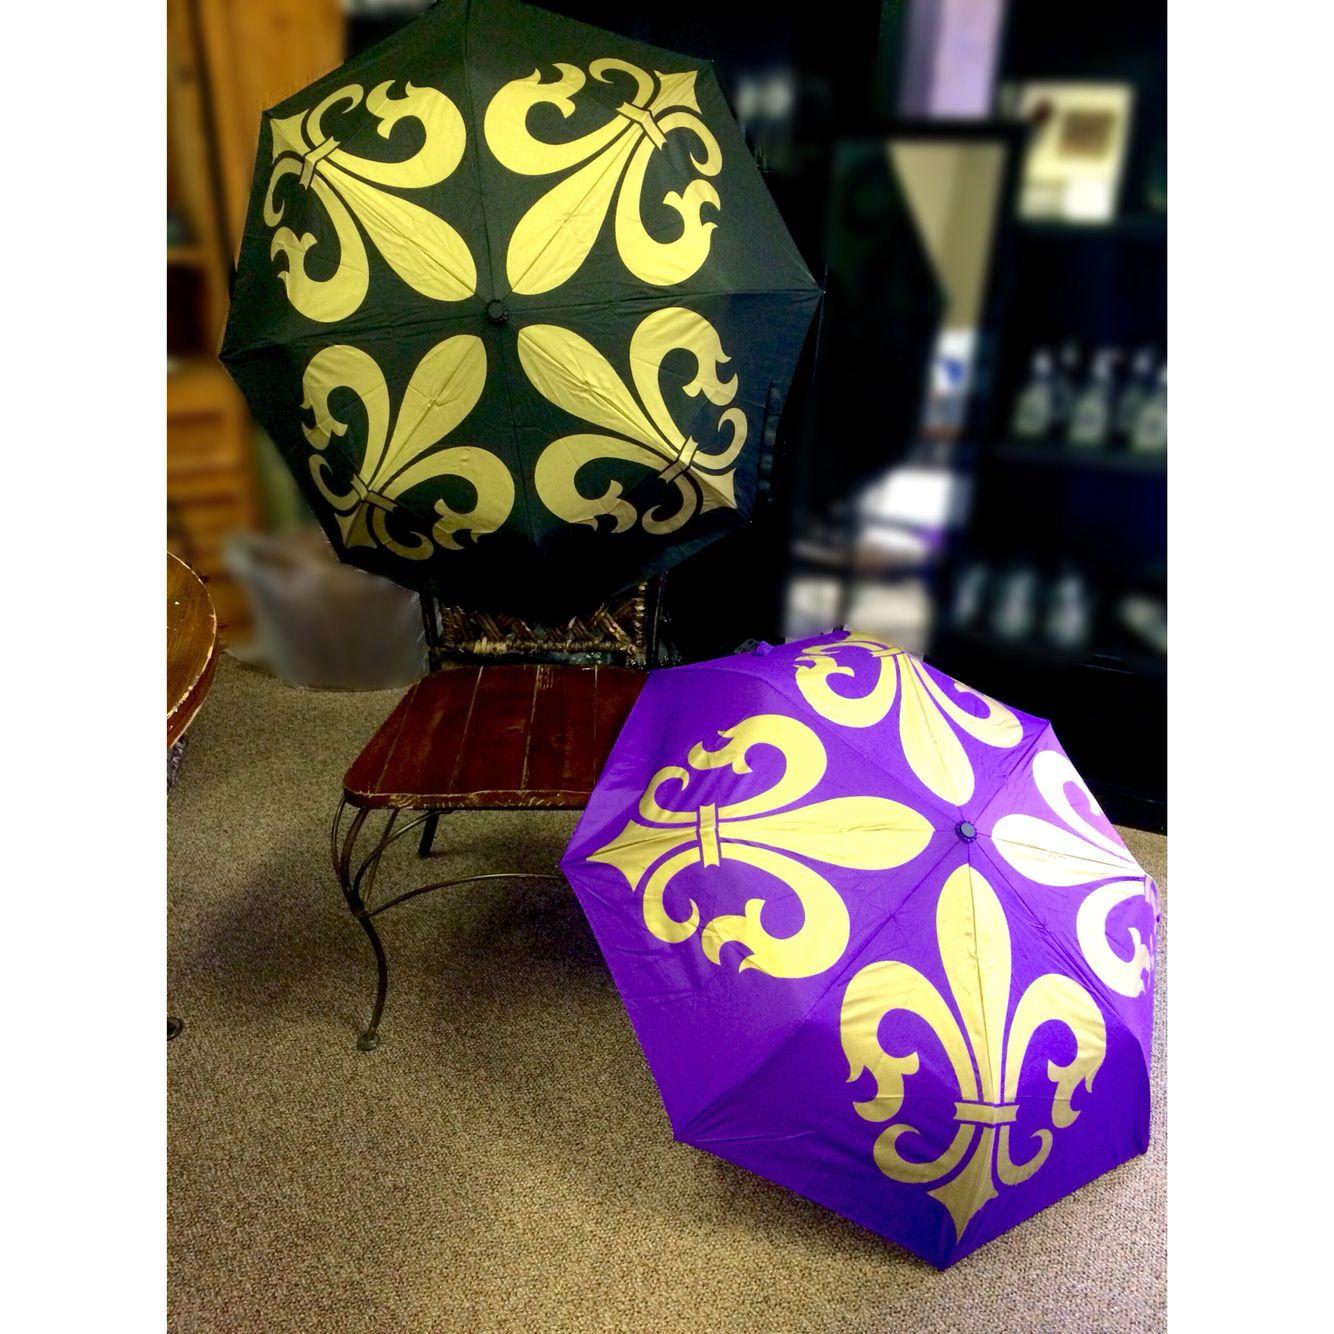 A Plus Gifts - FDL black/gold & purple/gold Umbrella, 985-276-0929